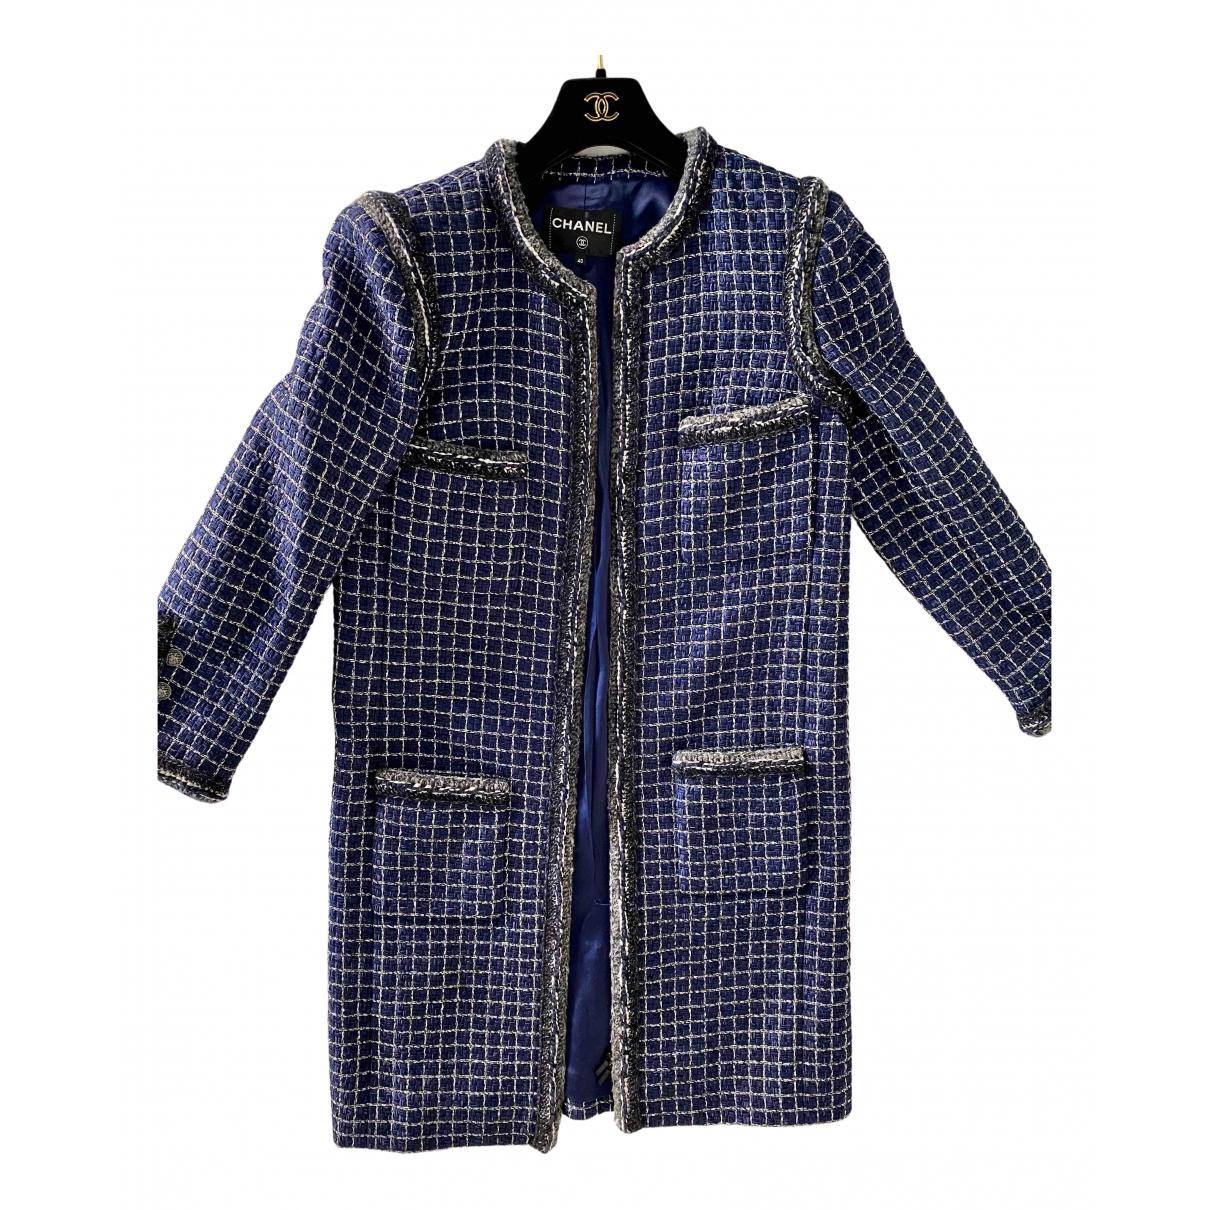 Chanel \N Jacke in  Marine Polyester